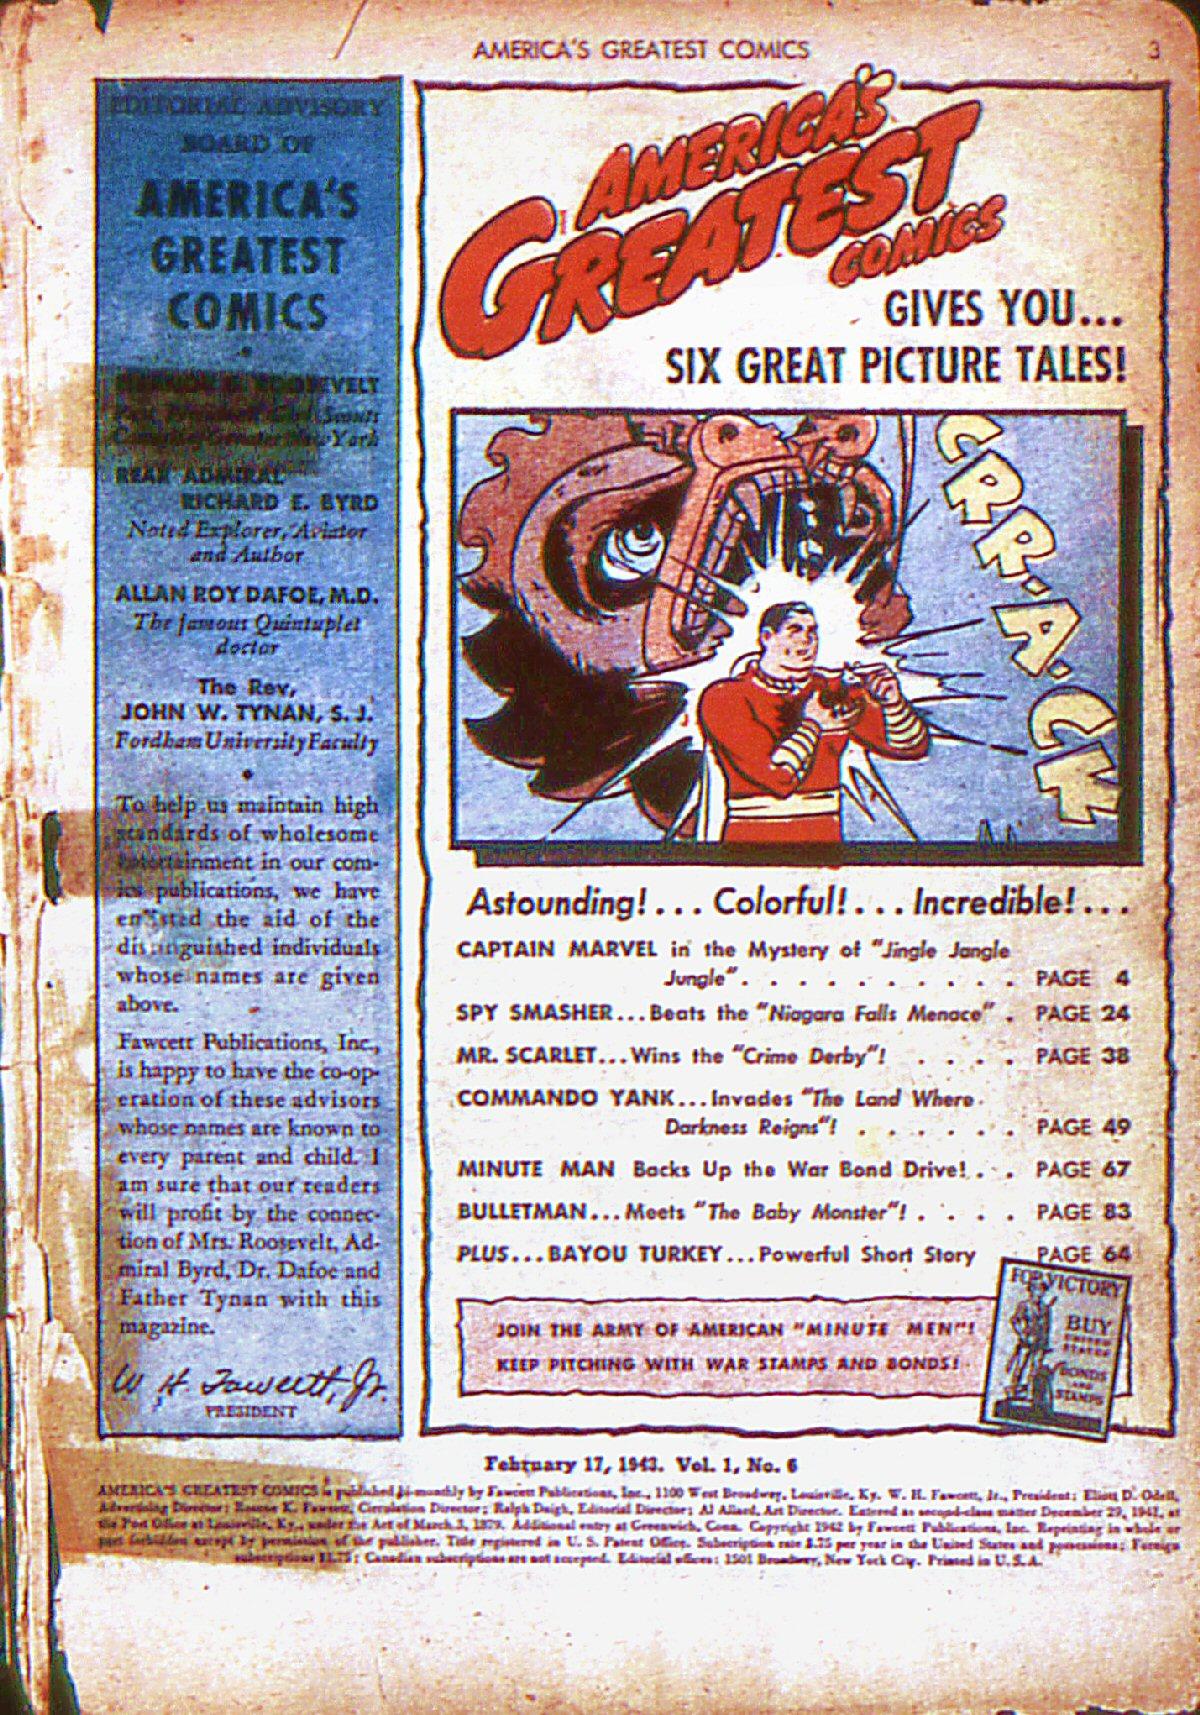 Read online America's Greatest Comics comic -  Issue #6 - 4